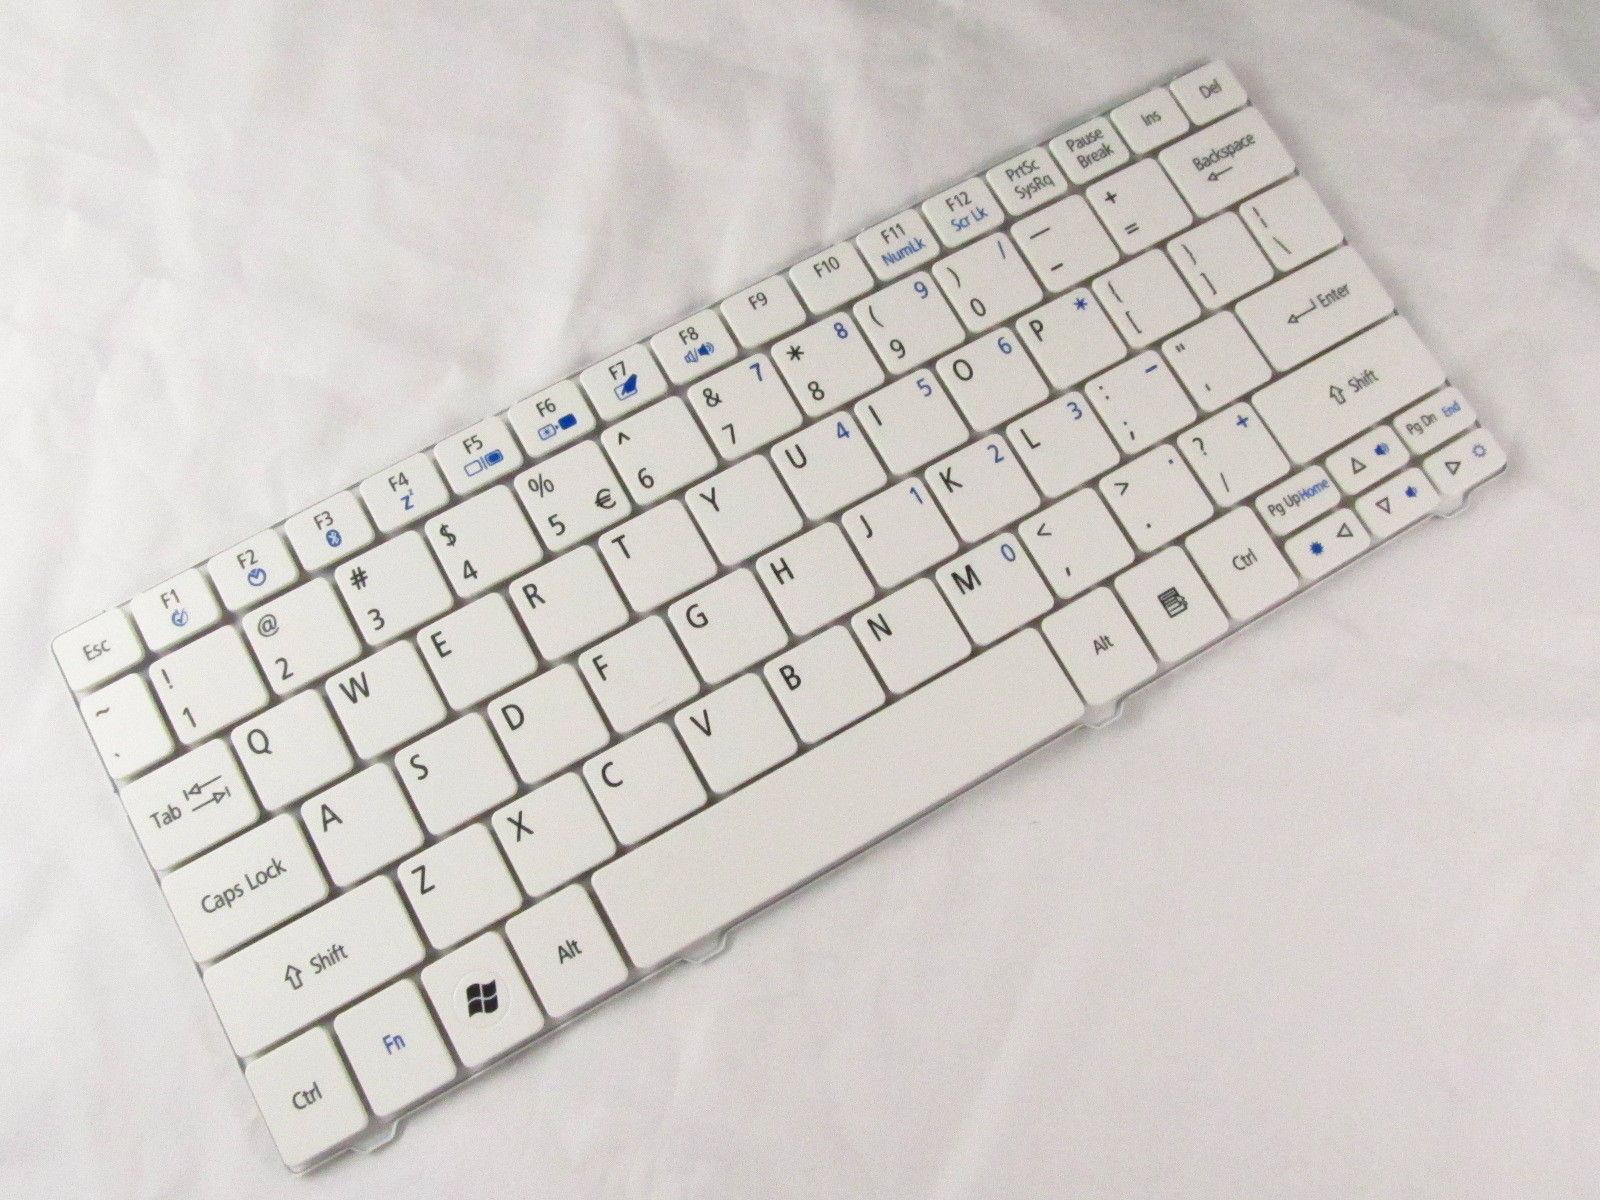 New Keyboard for Acer Aspire One 721 721H AO721 722 AO722 ZH7 ZA5 ZA3 SJM11 White